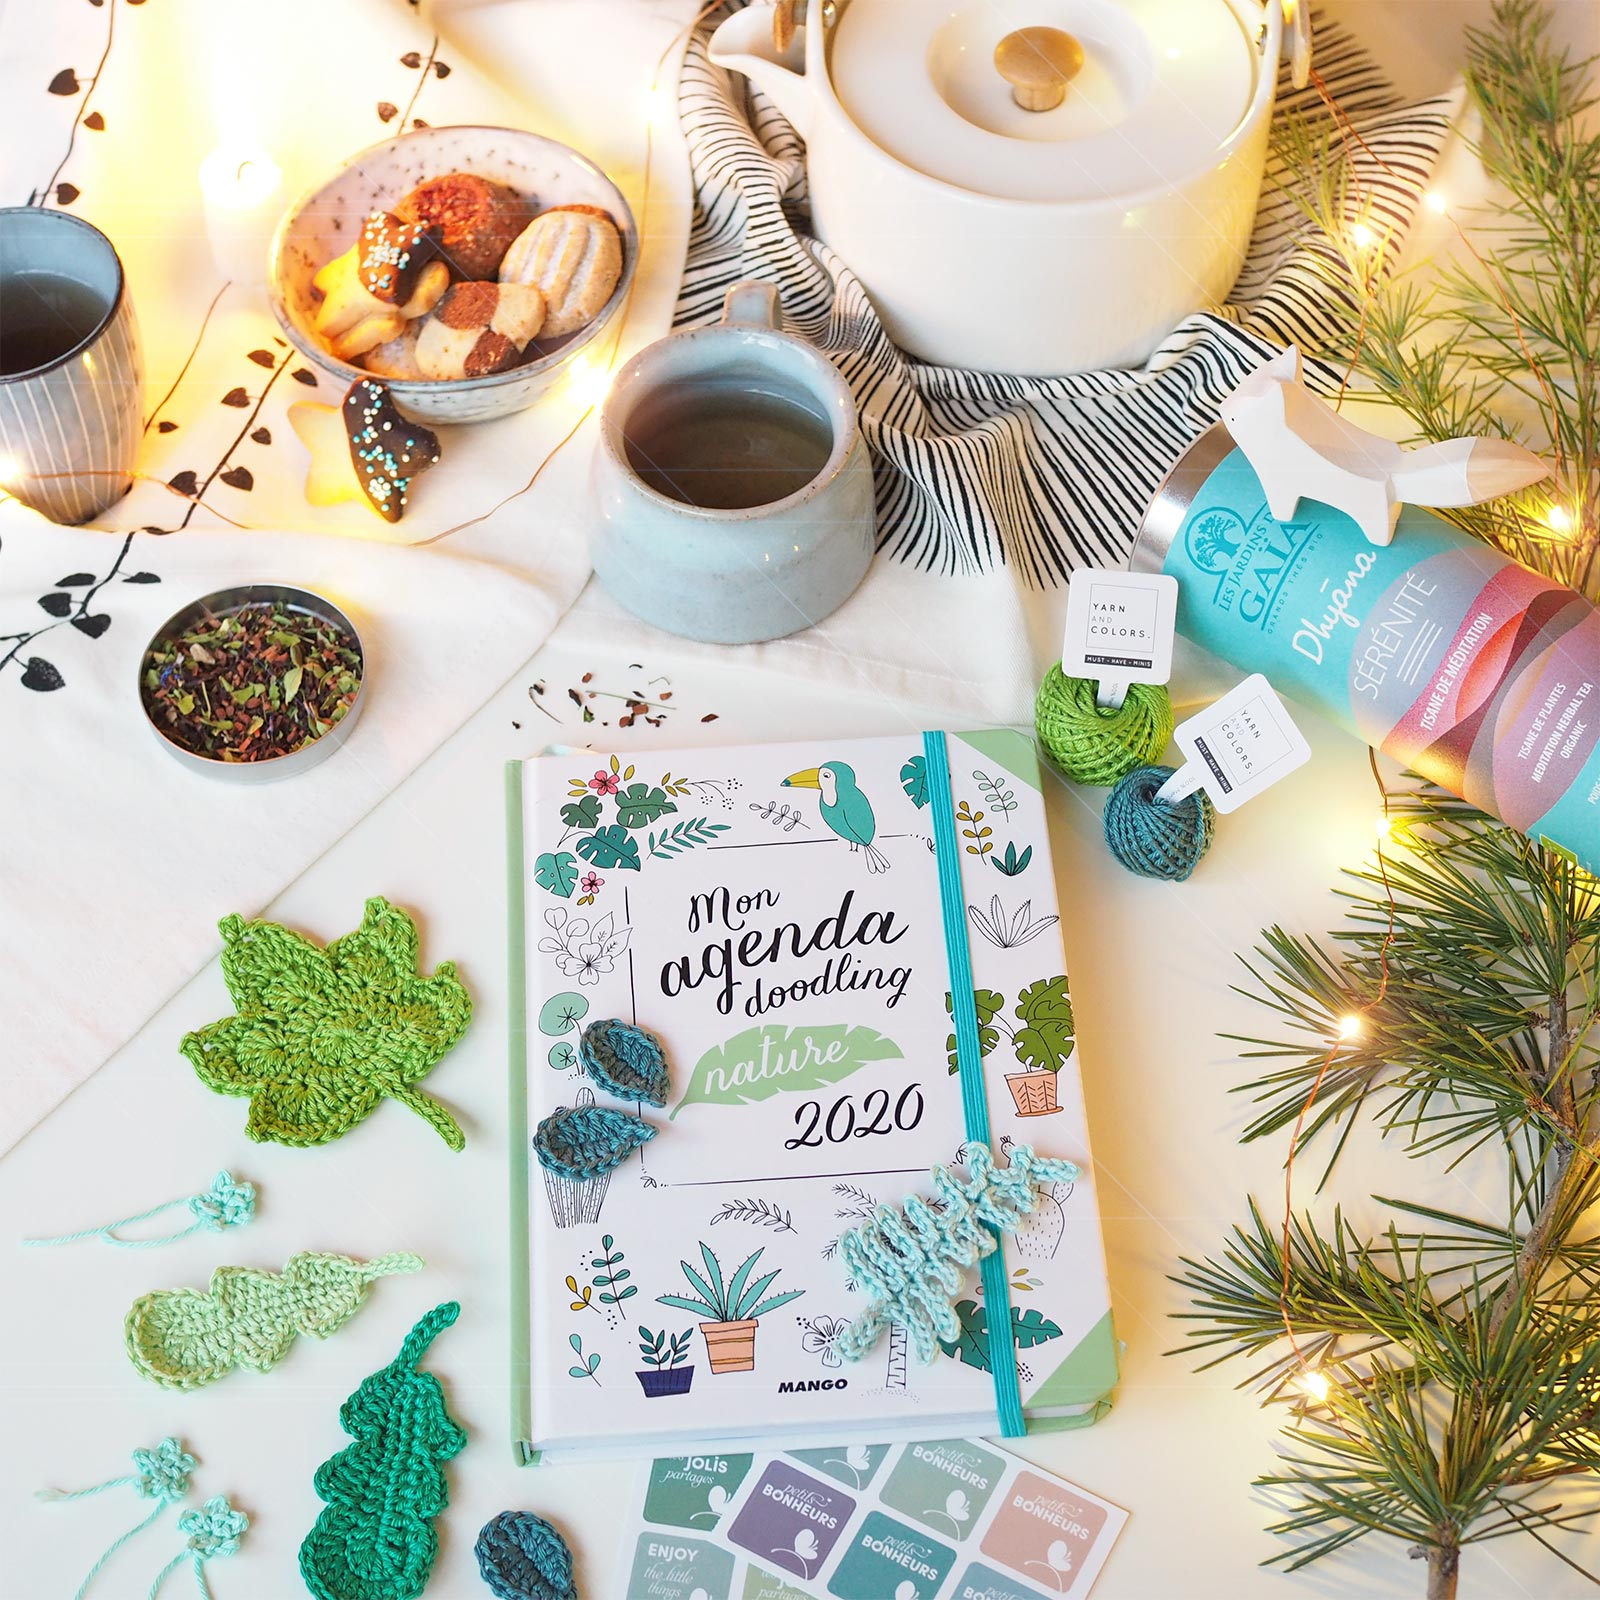 melimelothe-infusion-jardins-gaia-crochet agenda doodling nature 2020 Editions Mango boutique melimelo